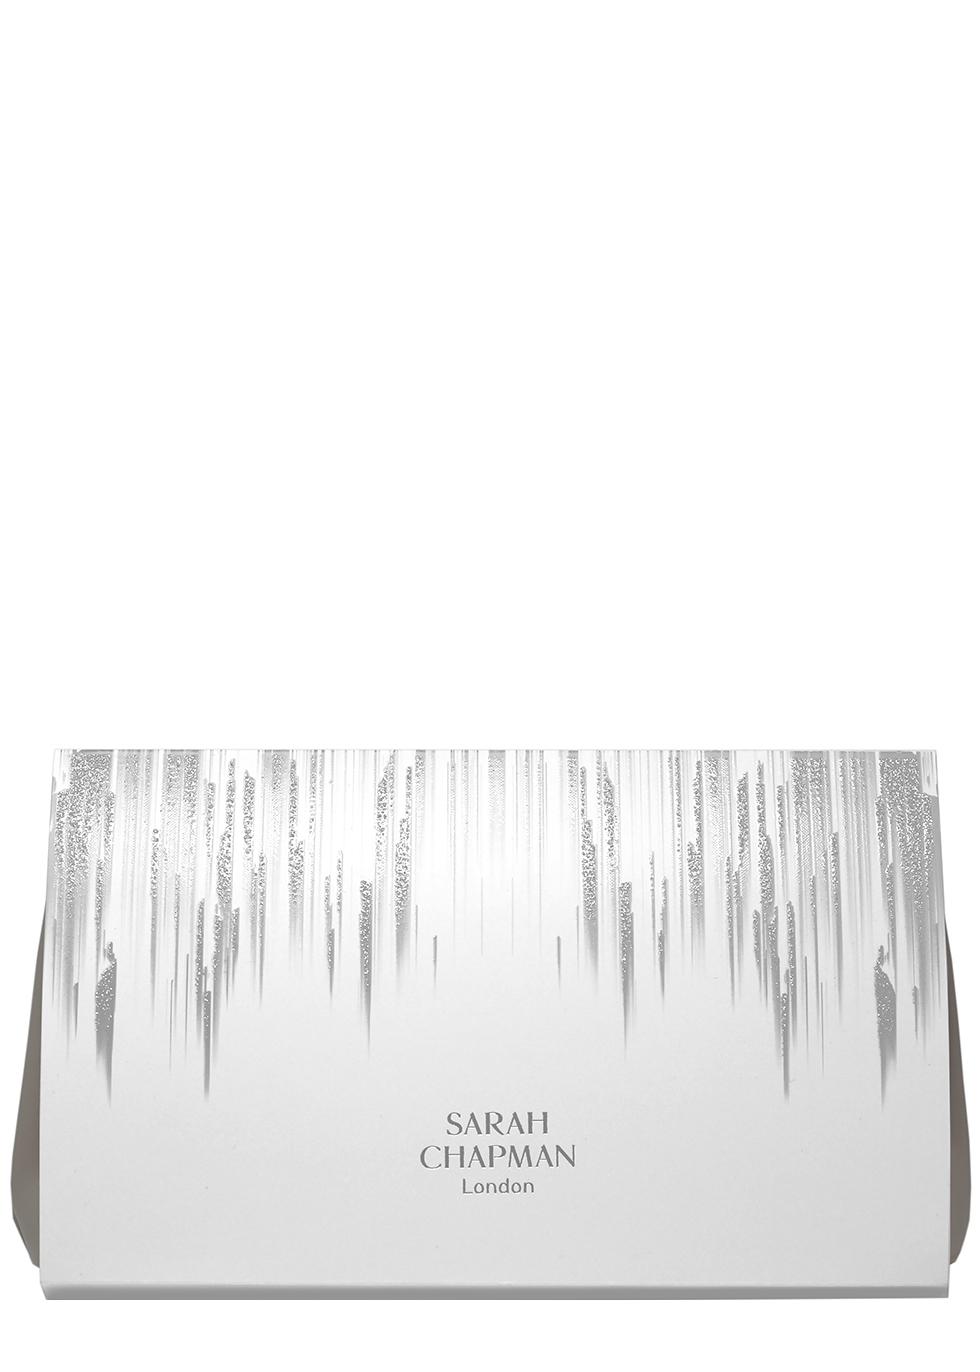 Seasonal Sparkle Bag - Sarah Chapman